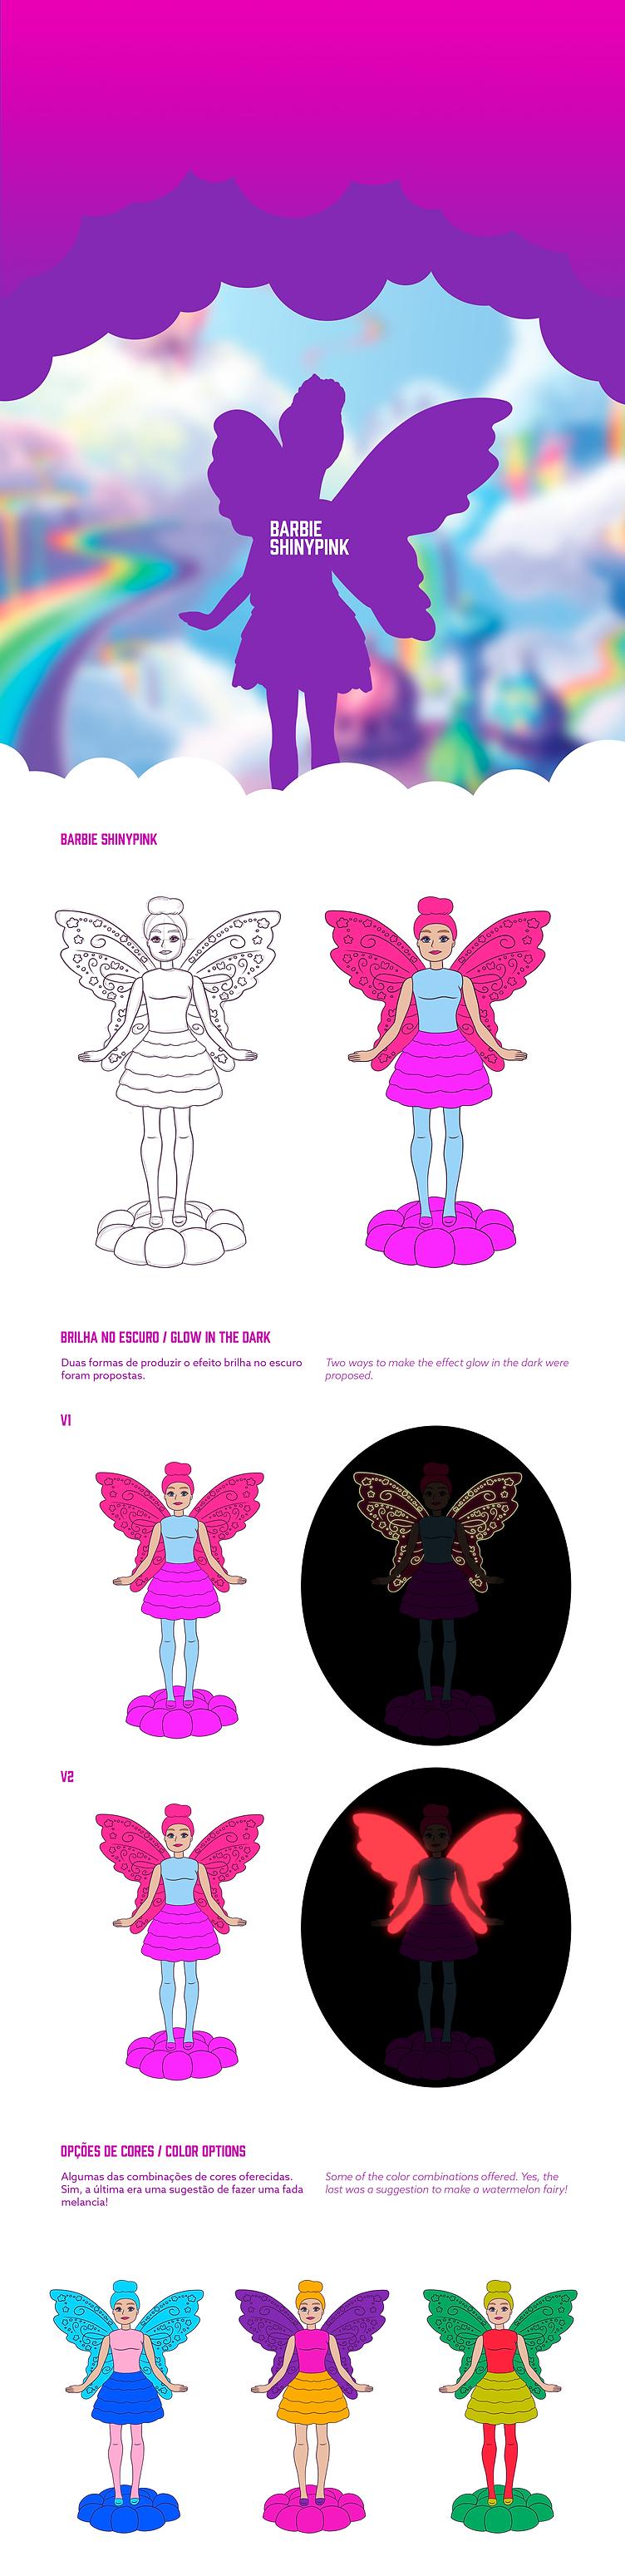 Behance---Barbie-Clouds---03A.png